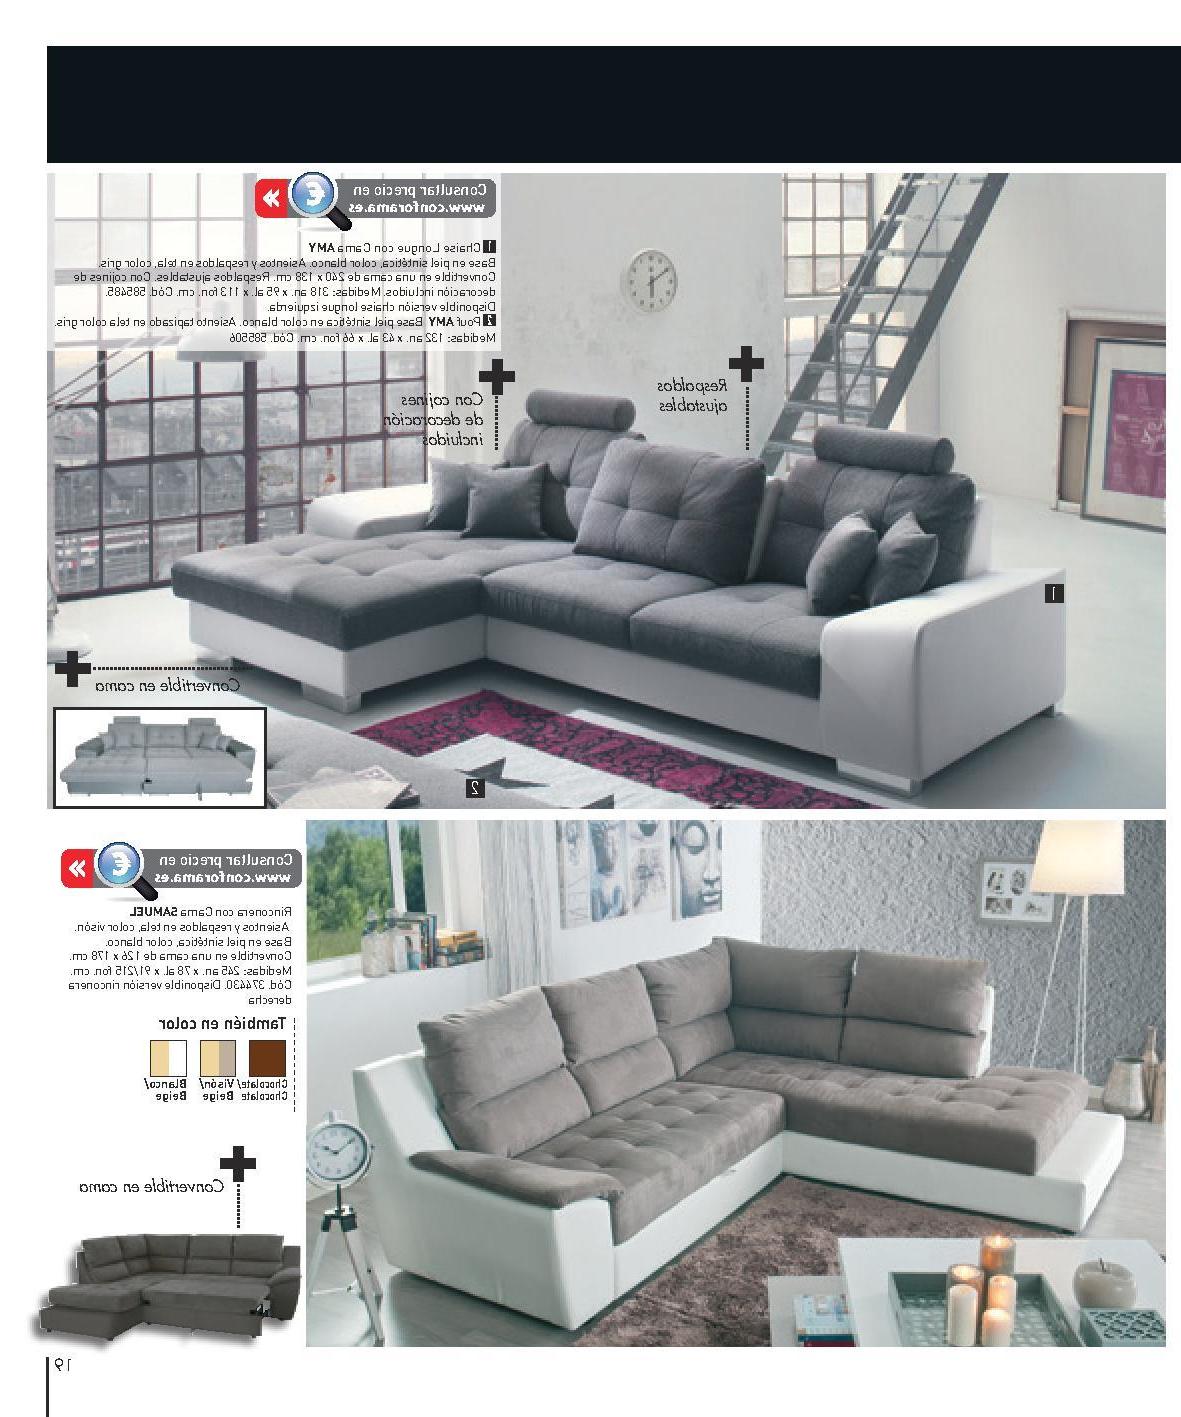 Sofa 2 Plazas Conforama 9ddf sofa Xxl Conforama Confo Depot Canape Cheap Gallery Of Trendy Canape